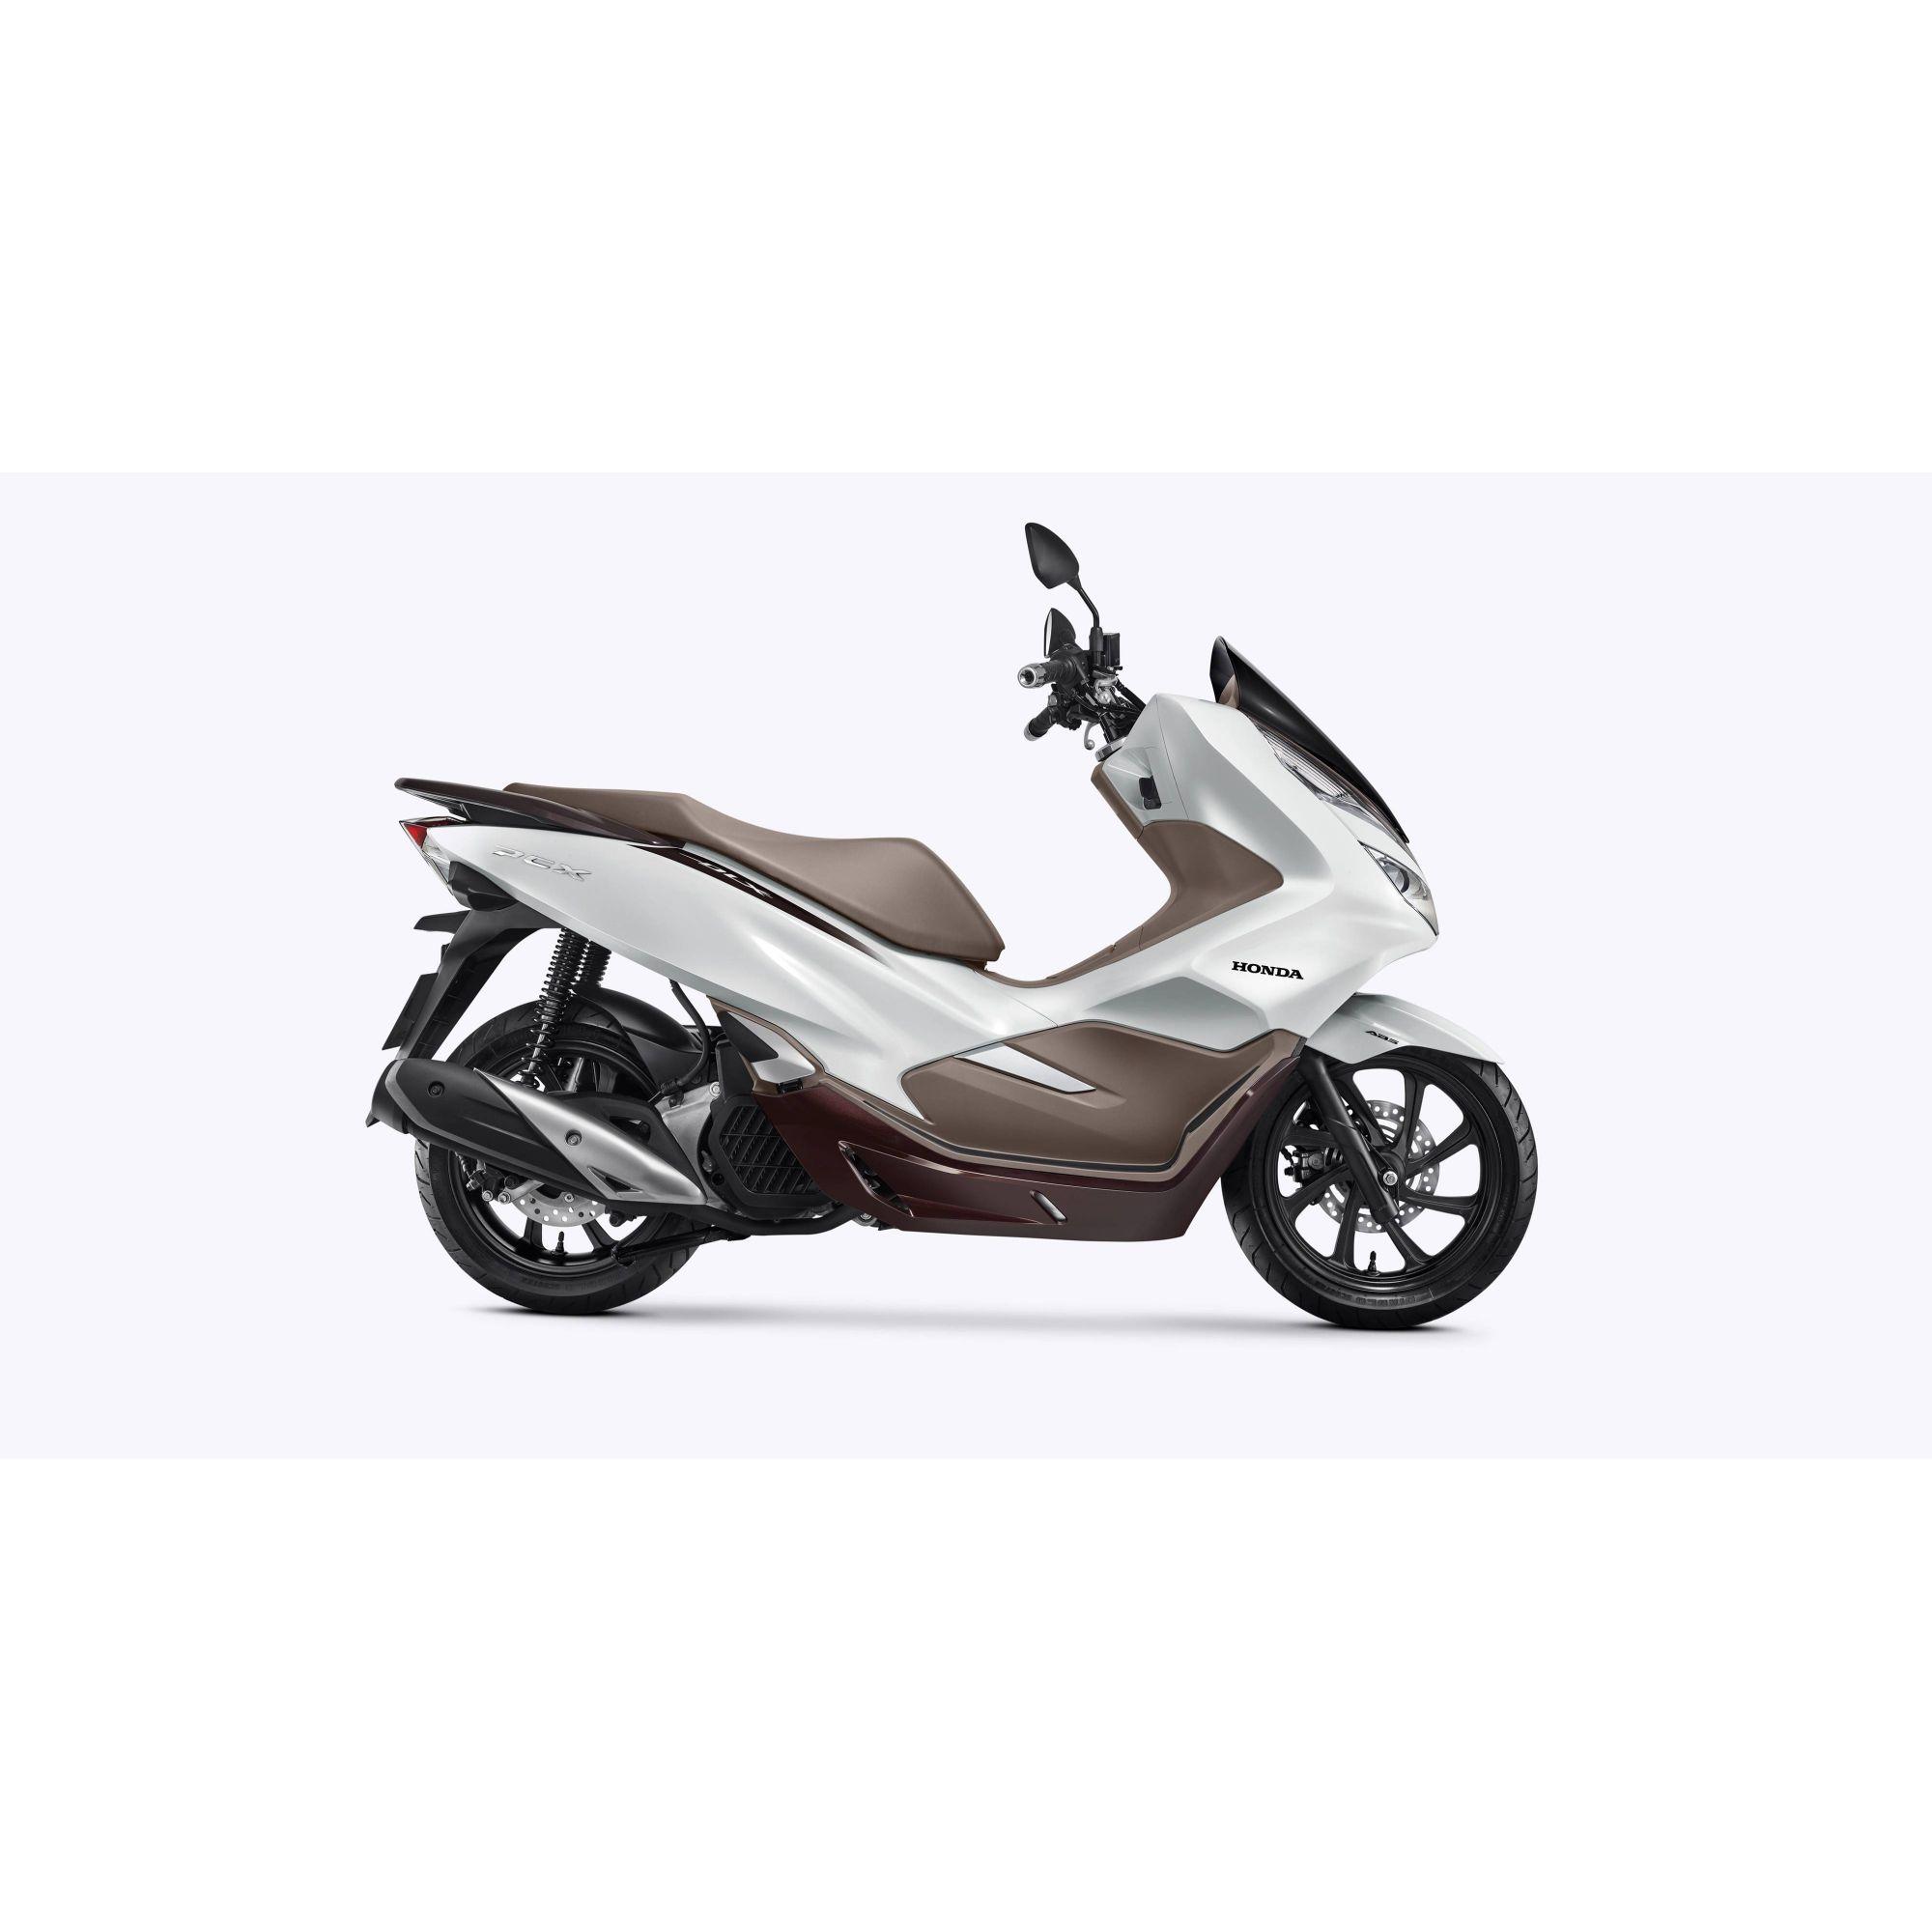 Pastilha Freio Nissin Honda Pcx 150 2019-2020 ABS Traseira